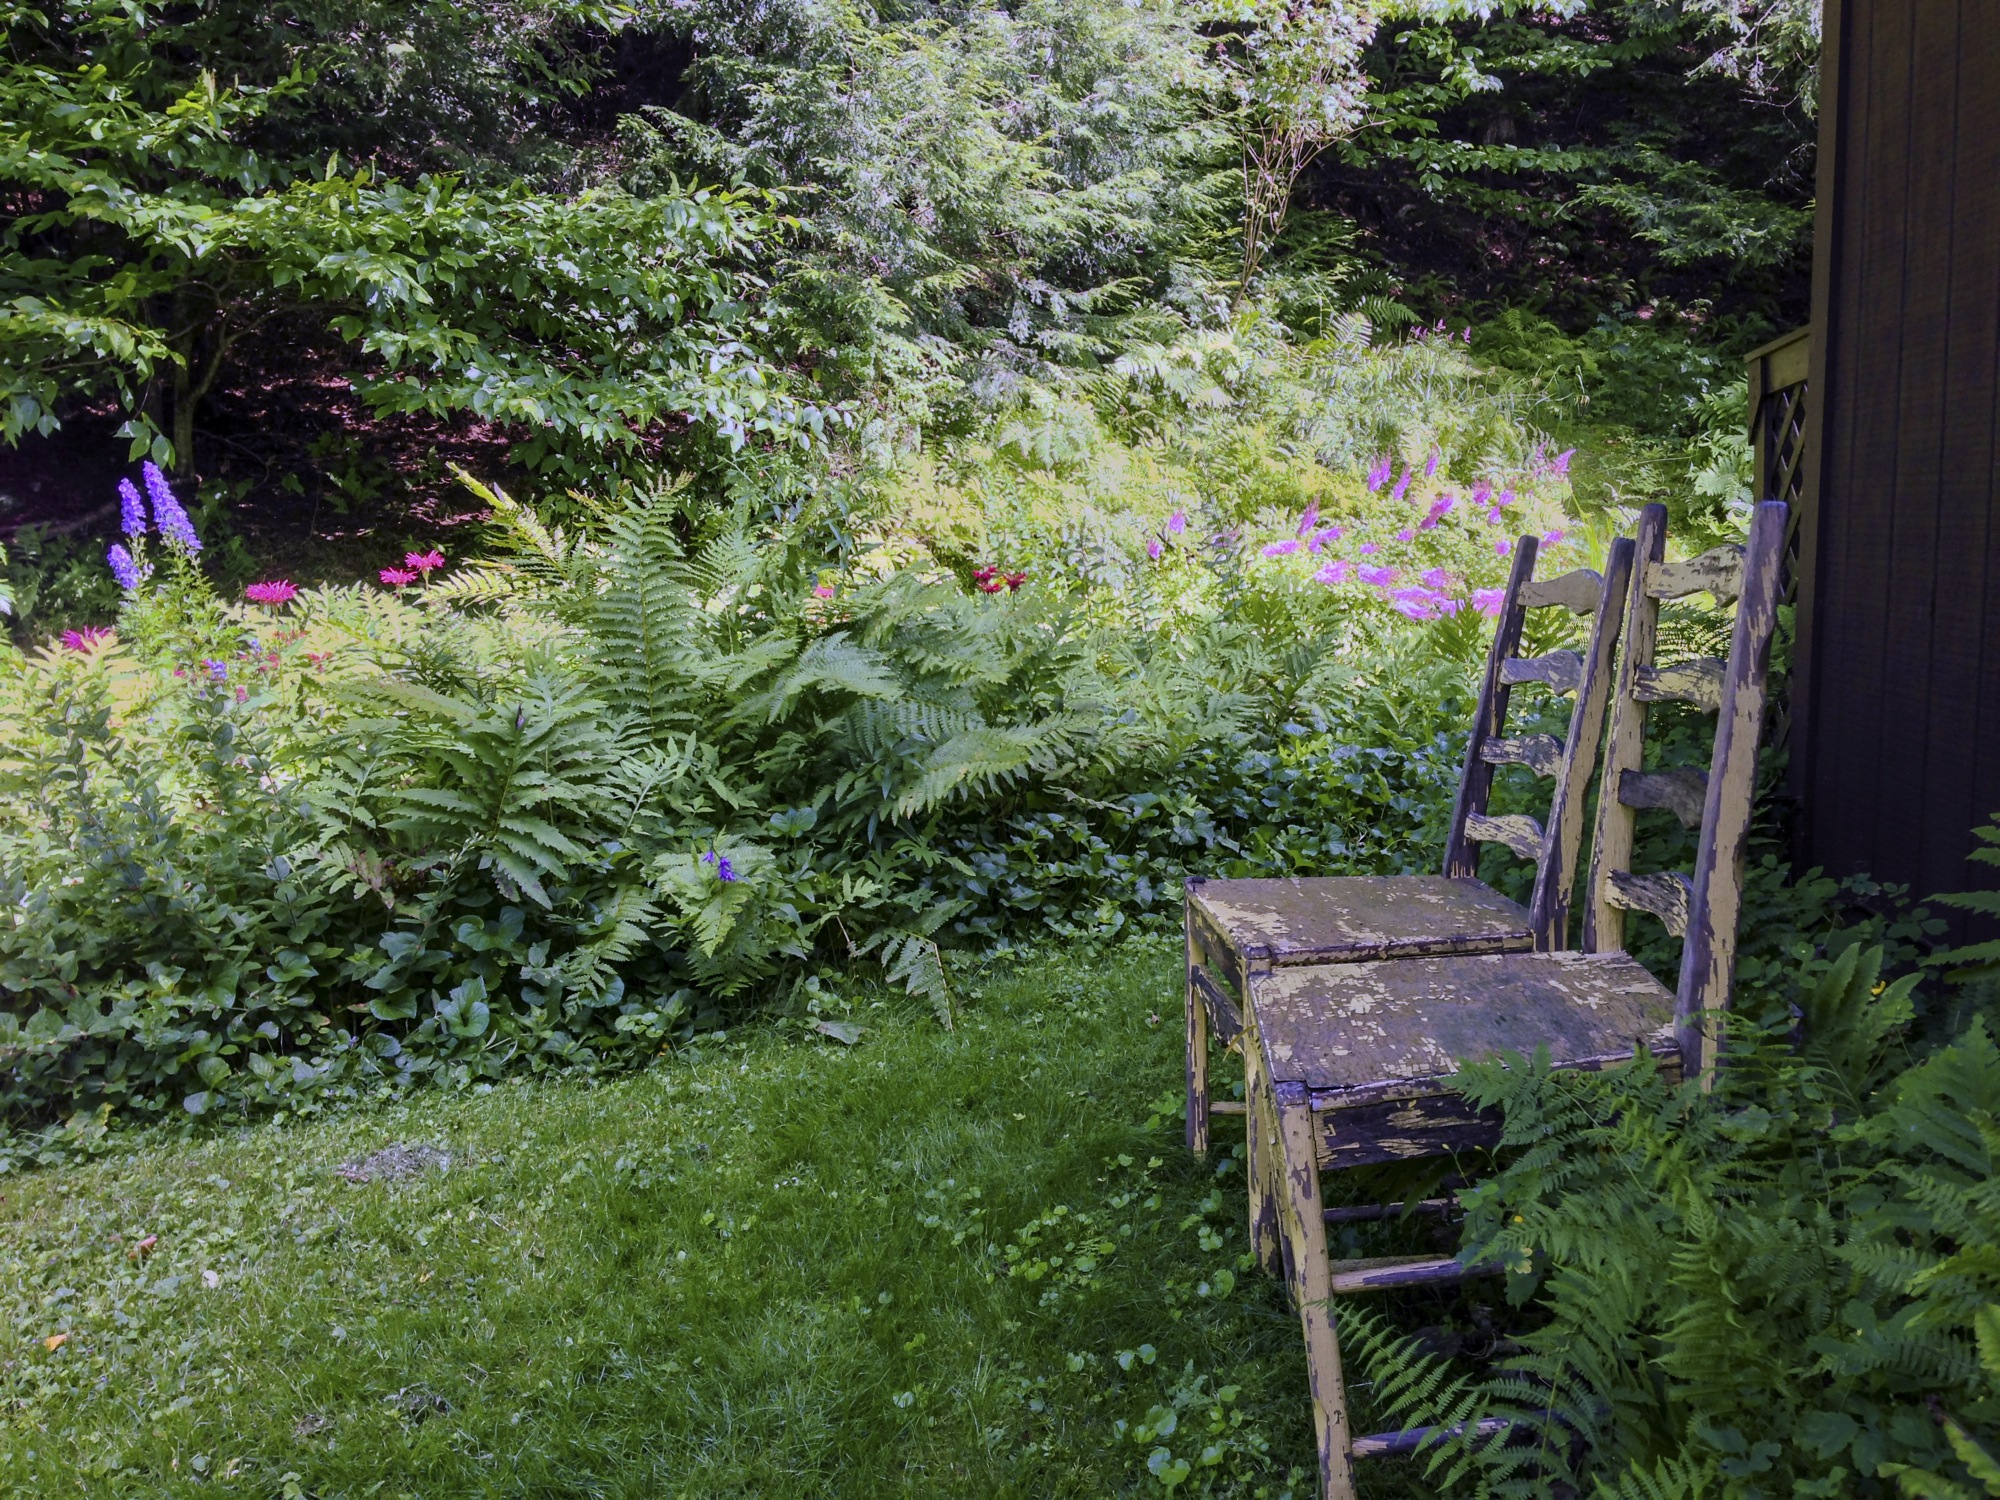 43-IMG_8549 Lipke Chairs in the Garden.jpg